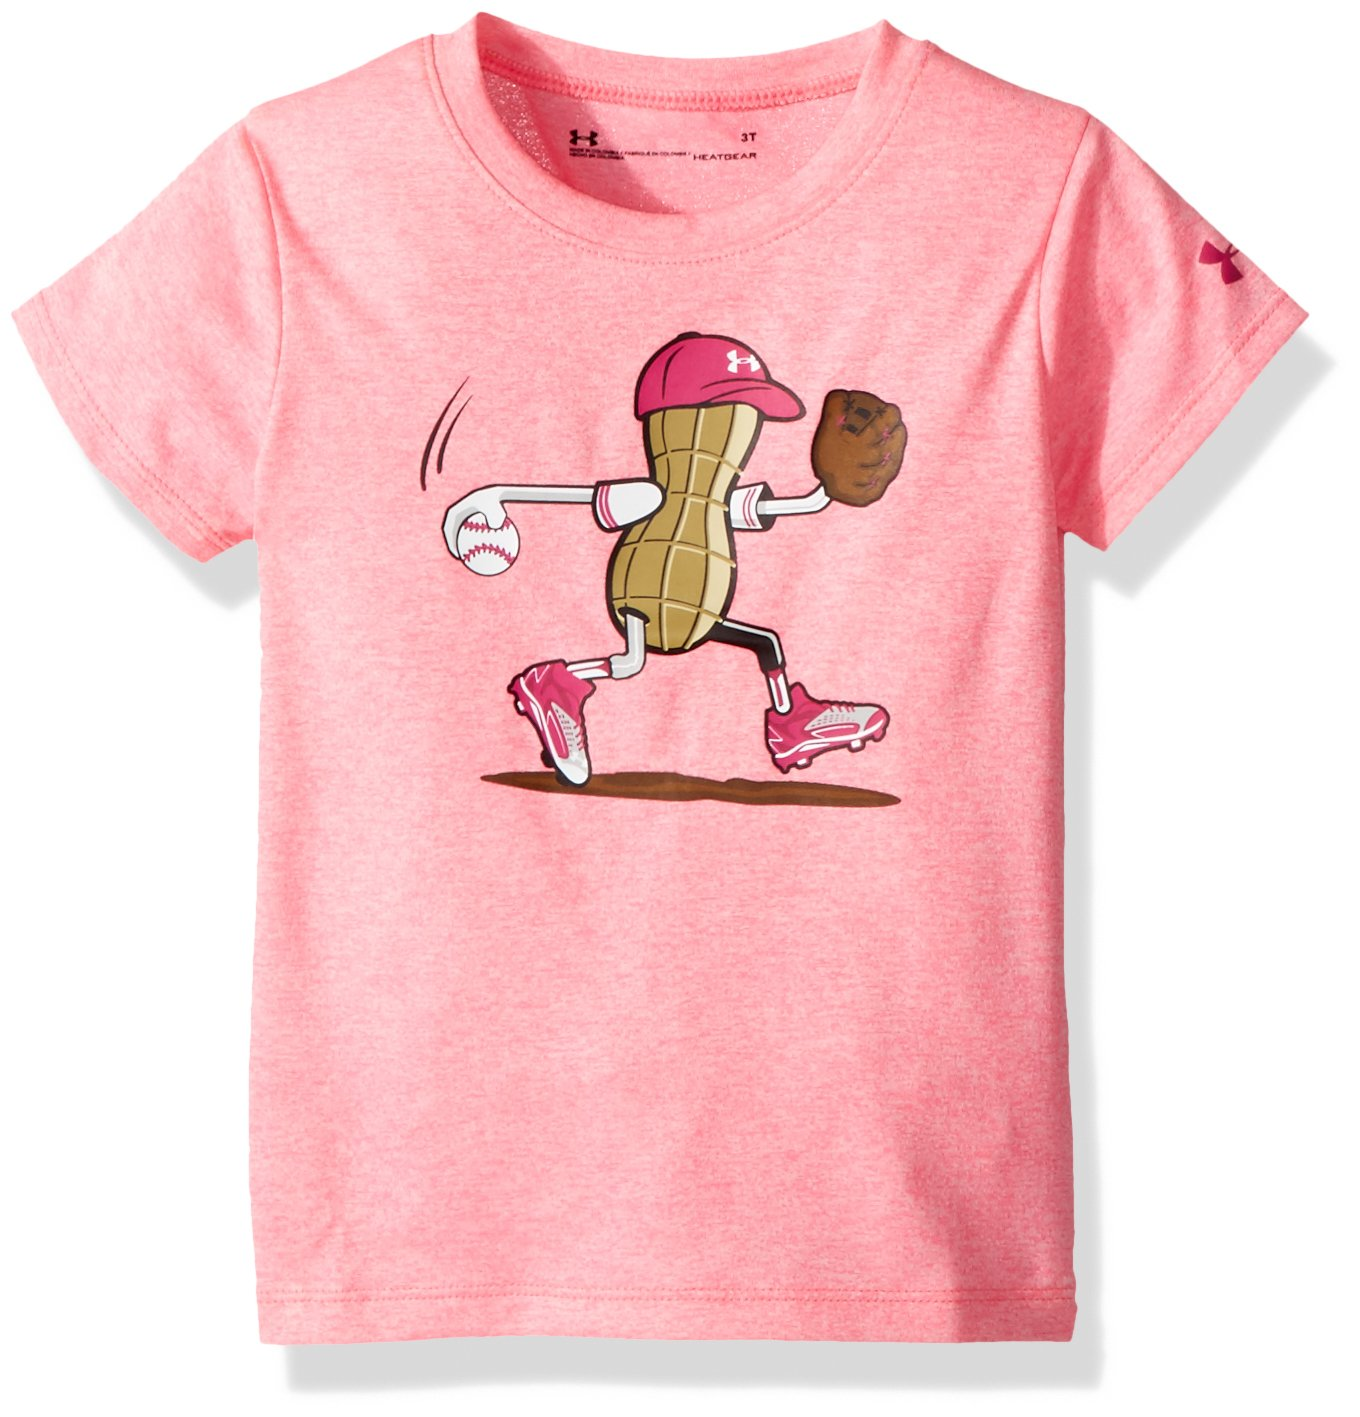 Under Armour Girls Softball Peanut Short Sleeve T-Shirt